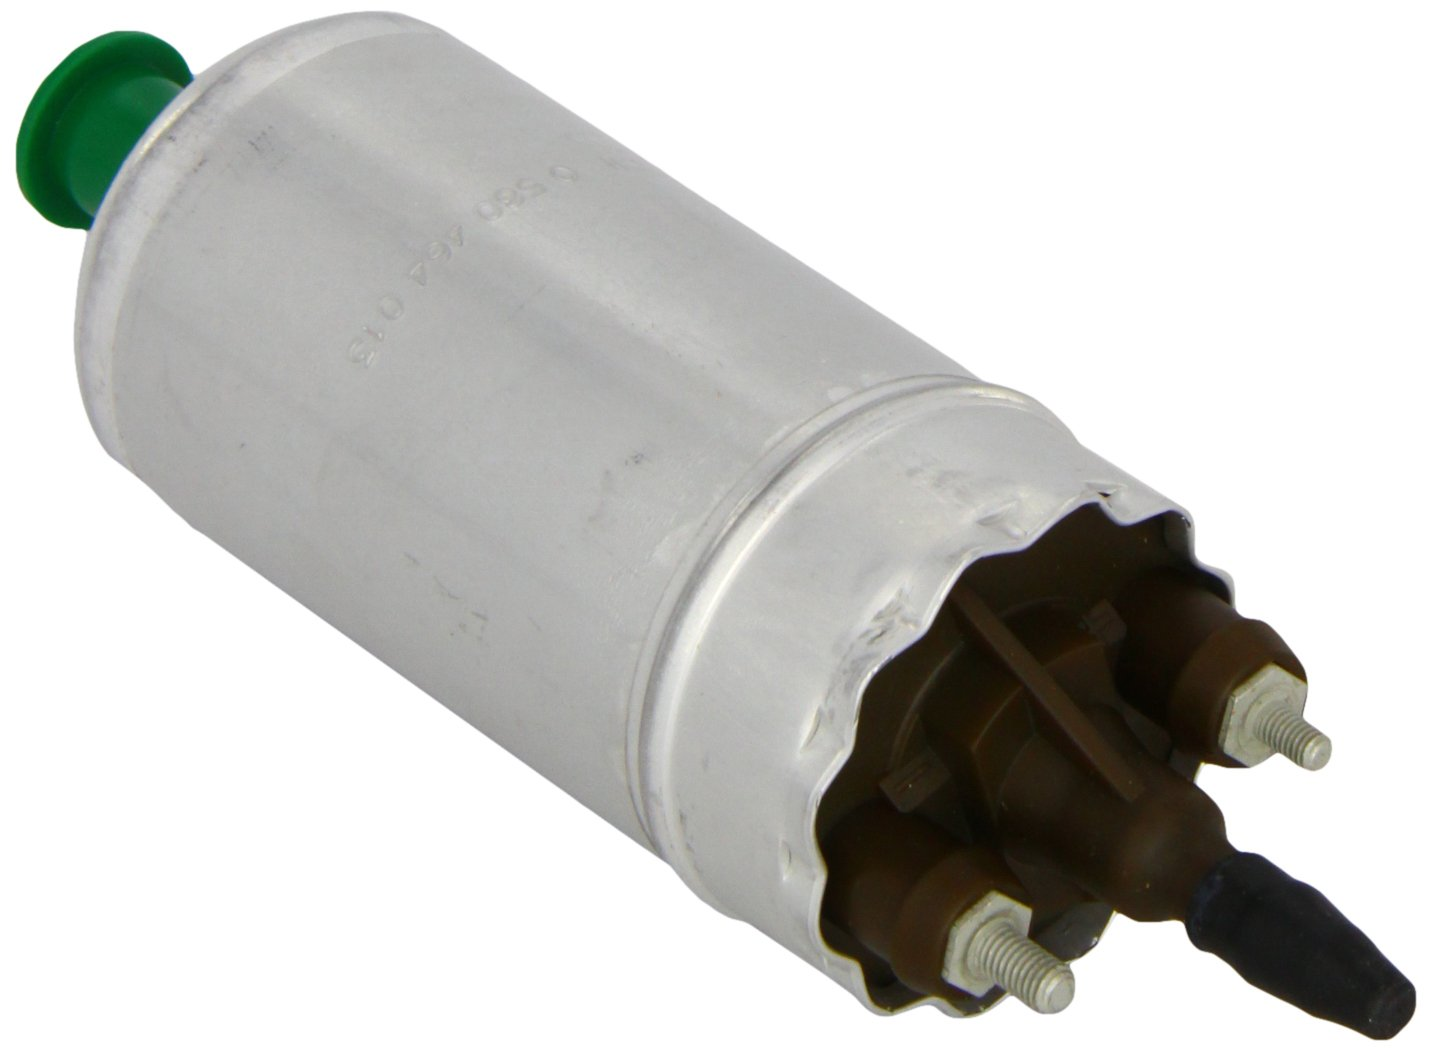 Bosch 0580464013 Electric Fuel Pump Robert Bosch GmbH Automotive Aftermarket 0 580 464 013